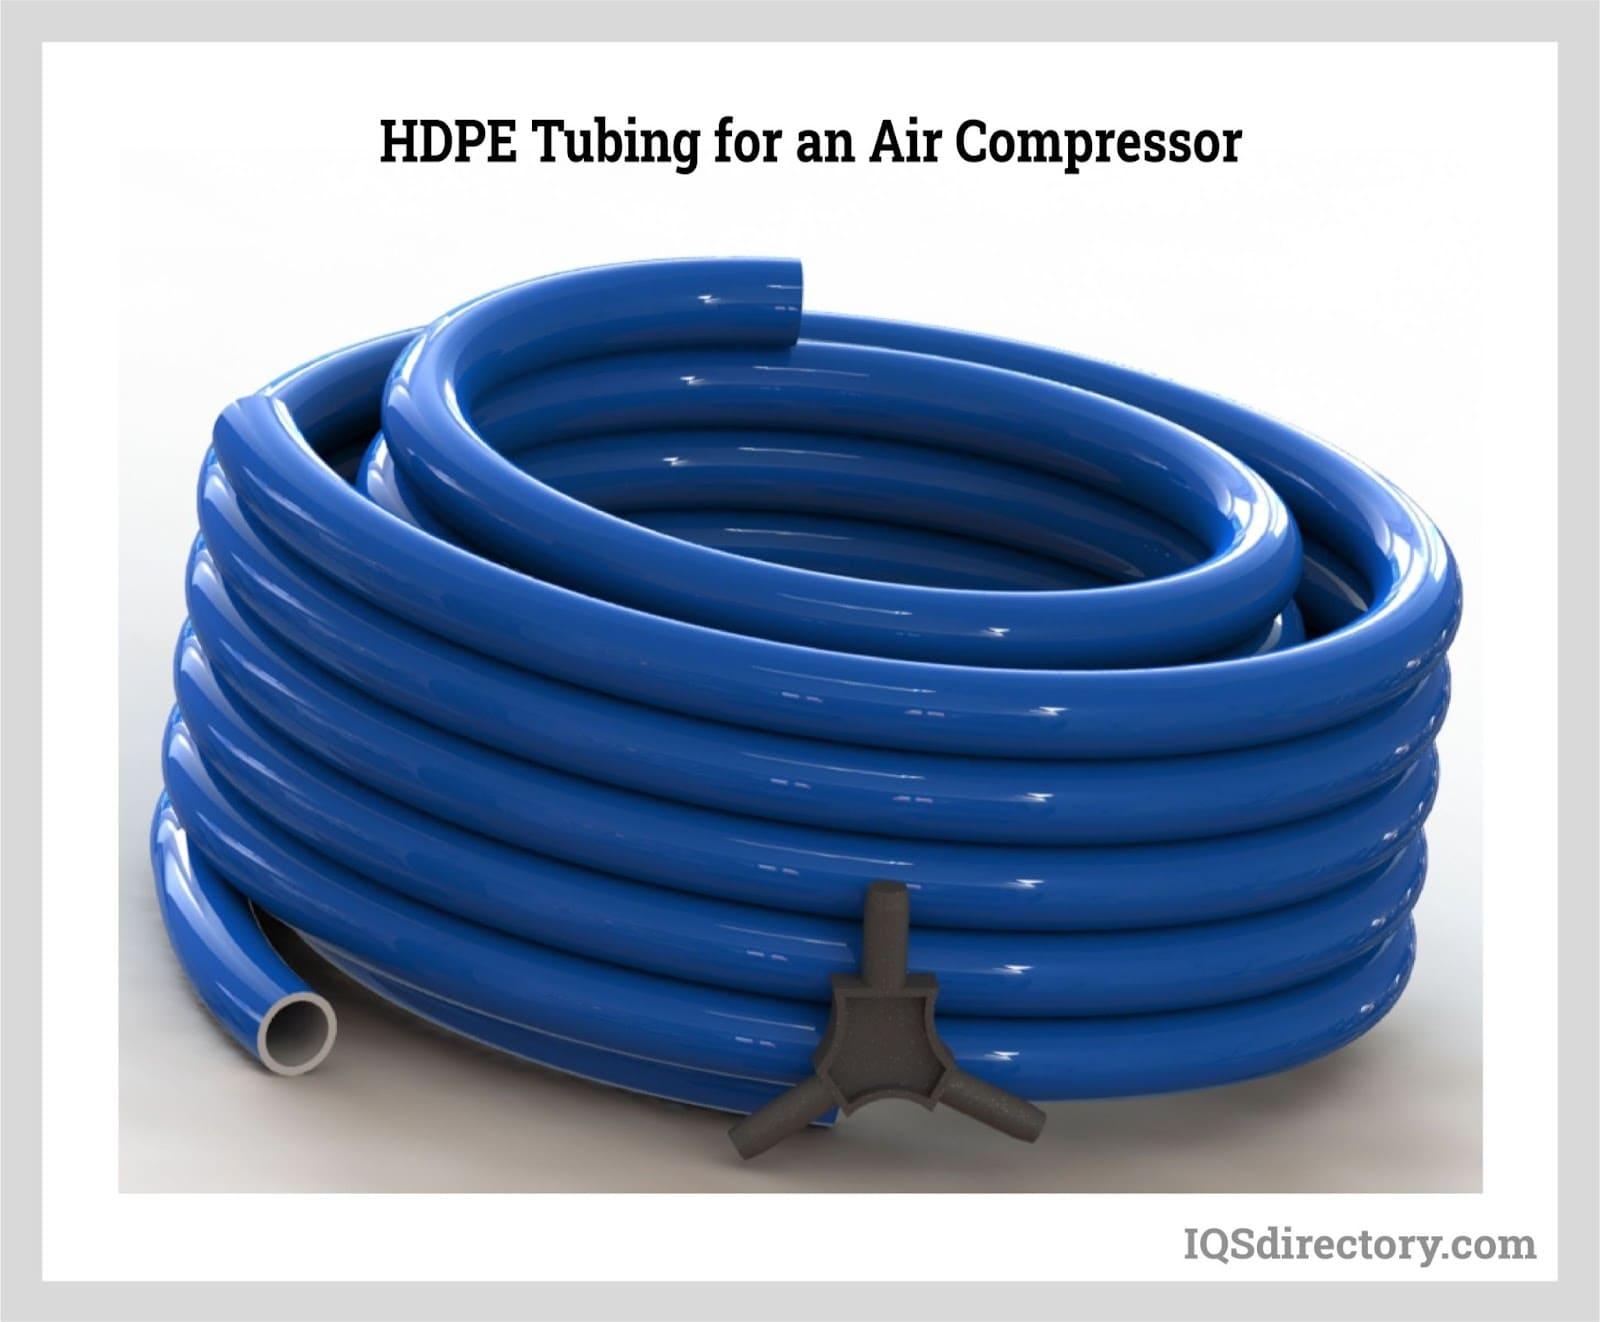 HDPE Tubing for an Air Compressor